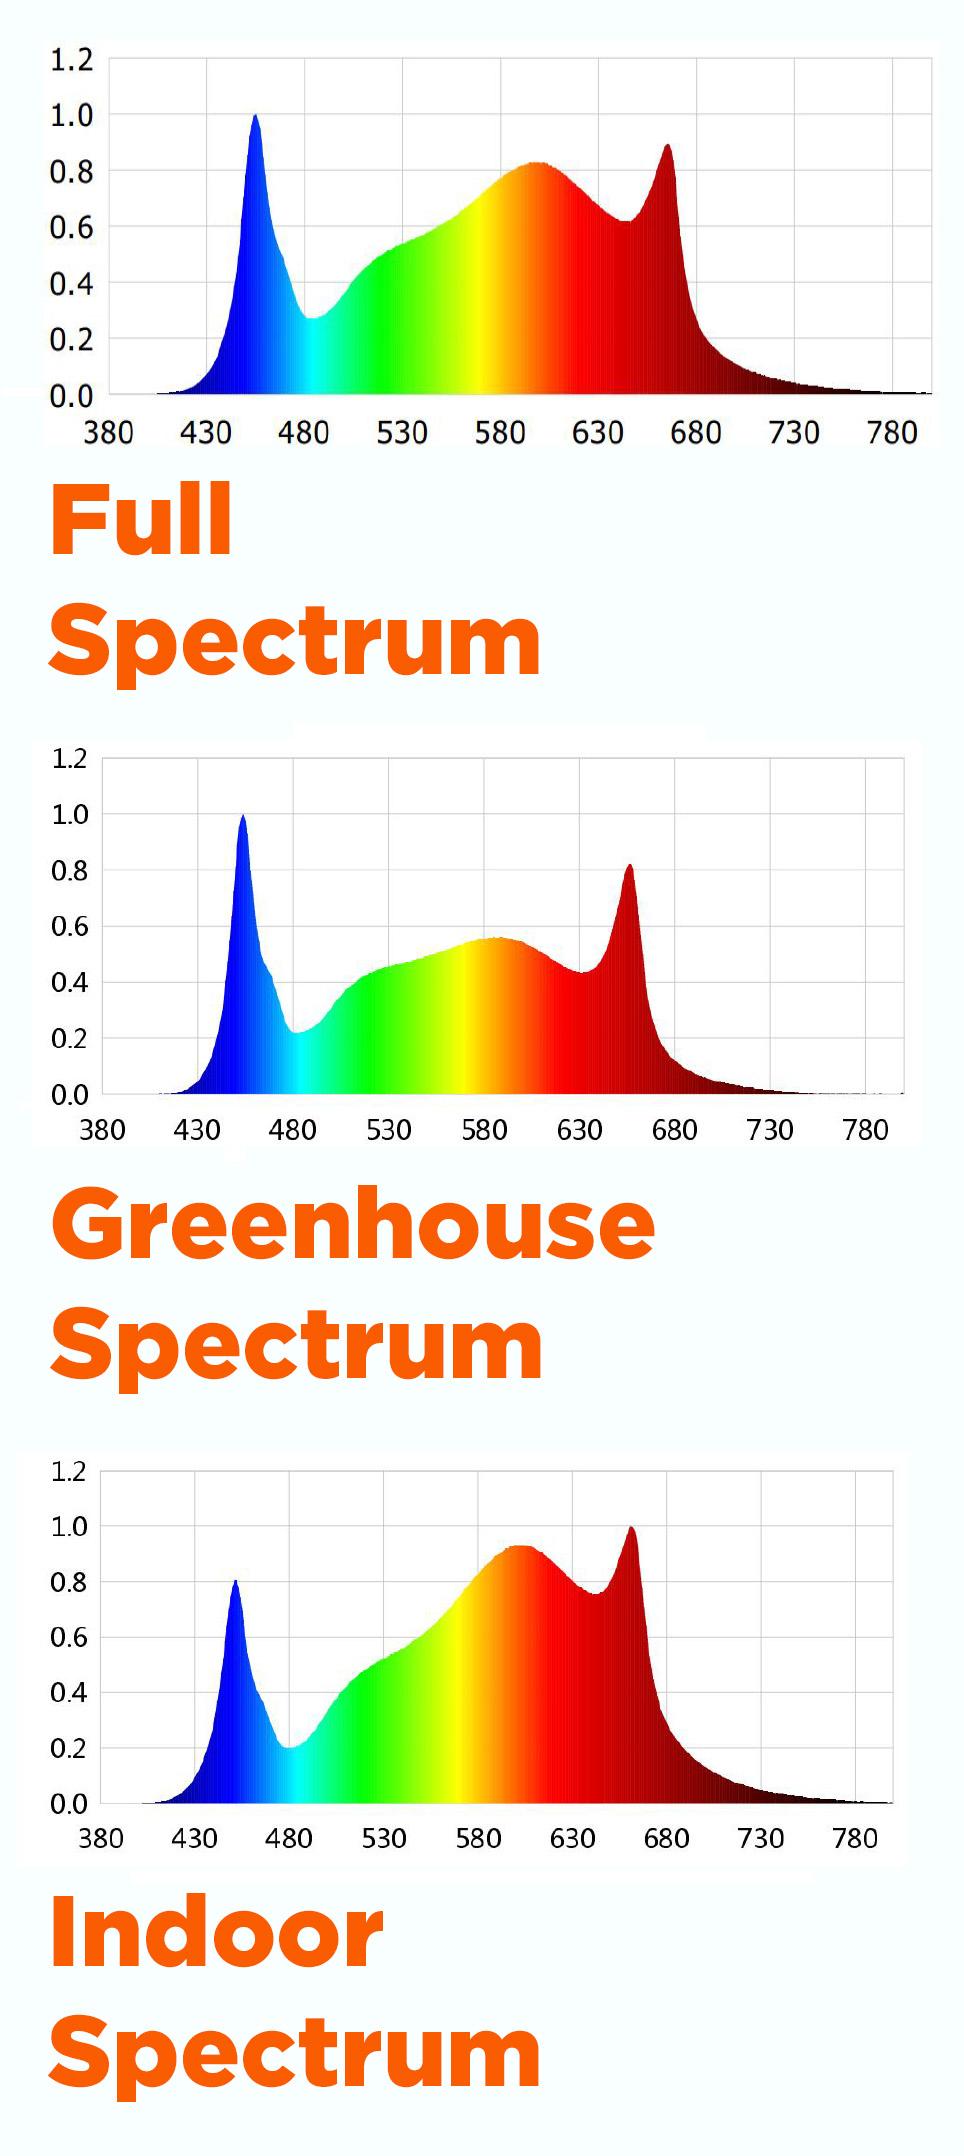 EverWatt LED Grow Light Spectrum Specifications